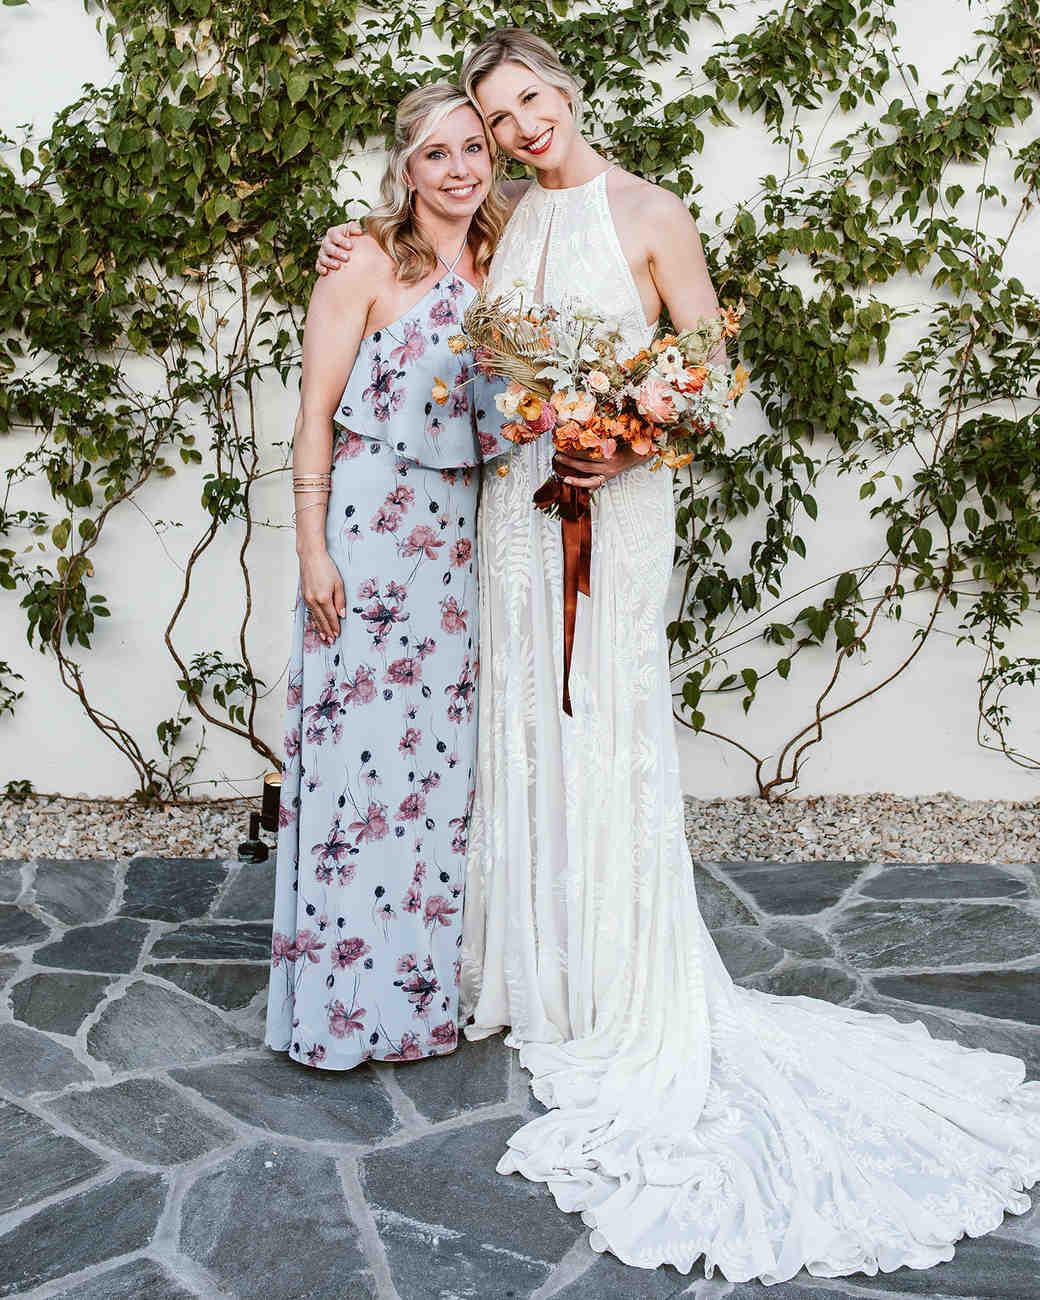 lisa sam mexico wedding friend with bride